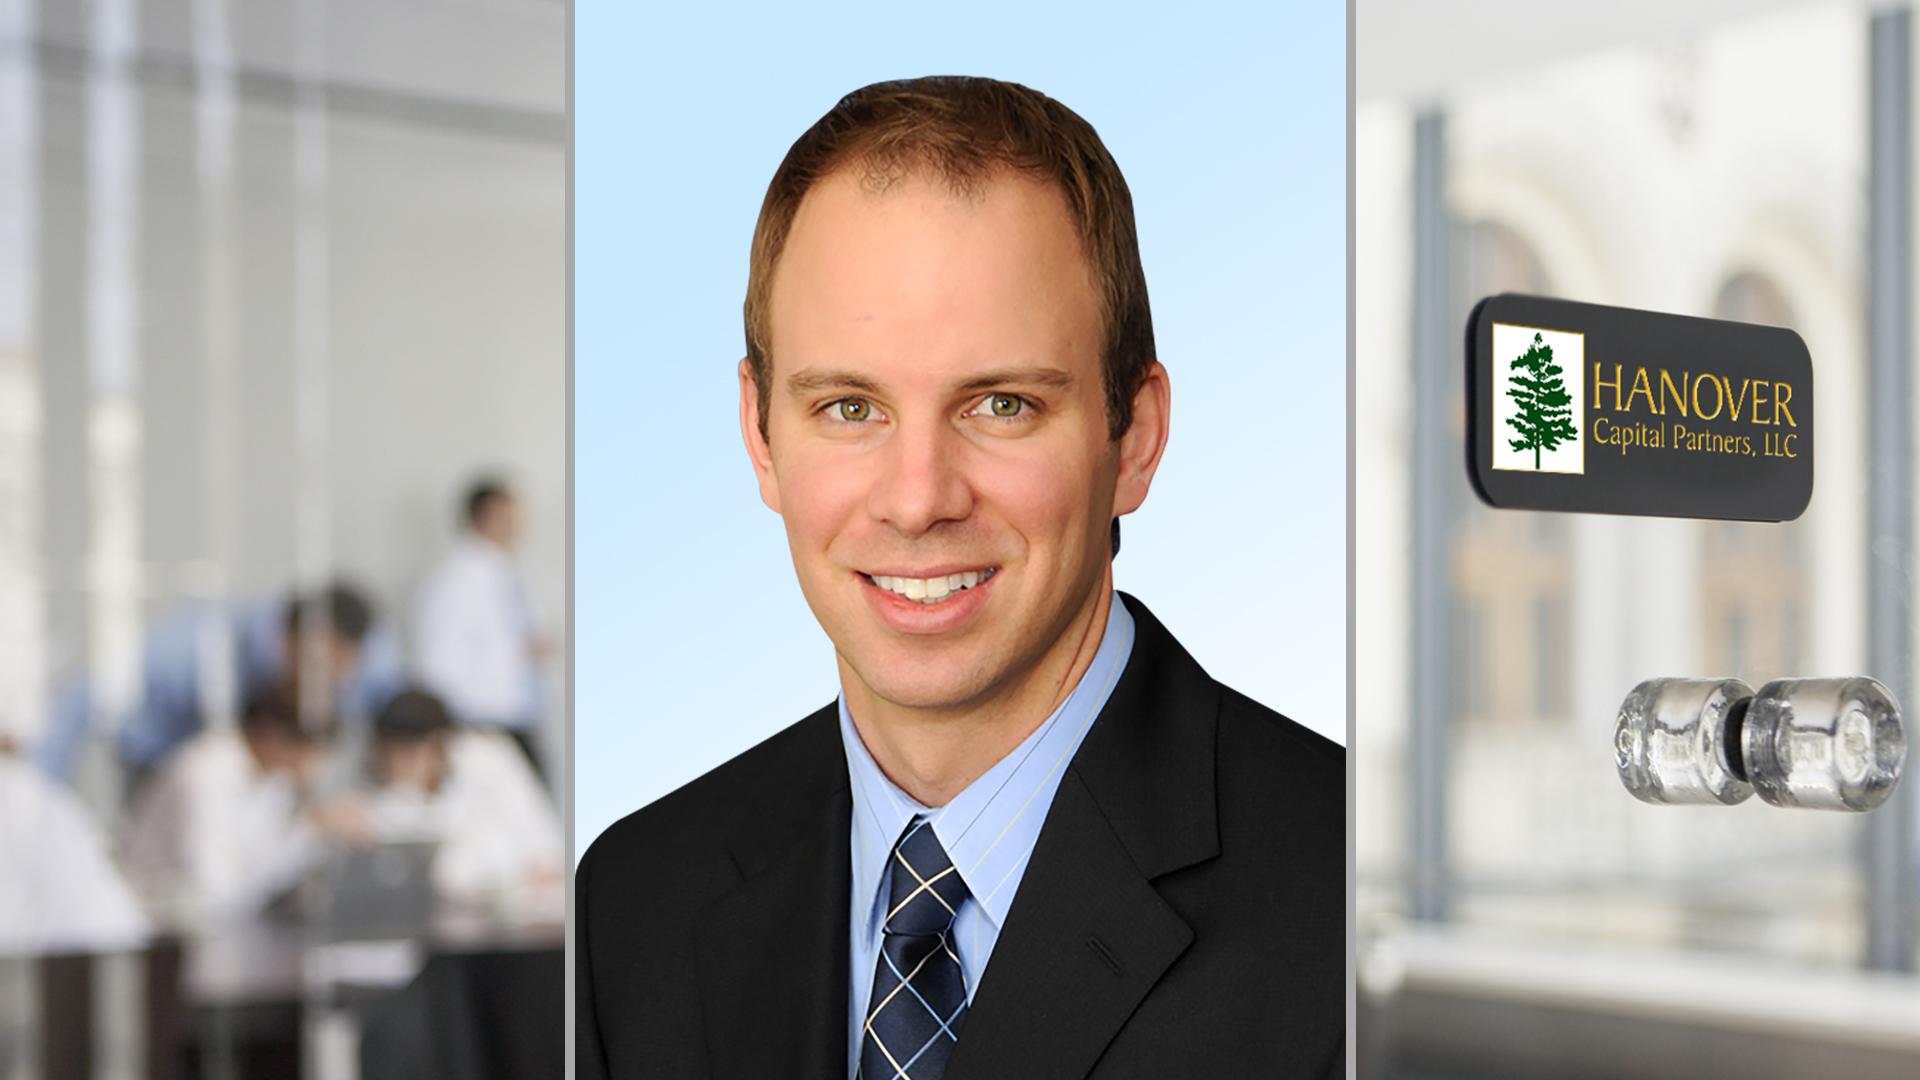 Stephen W. Orosz - Vice President of Finance